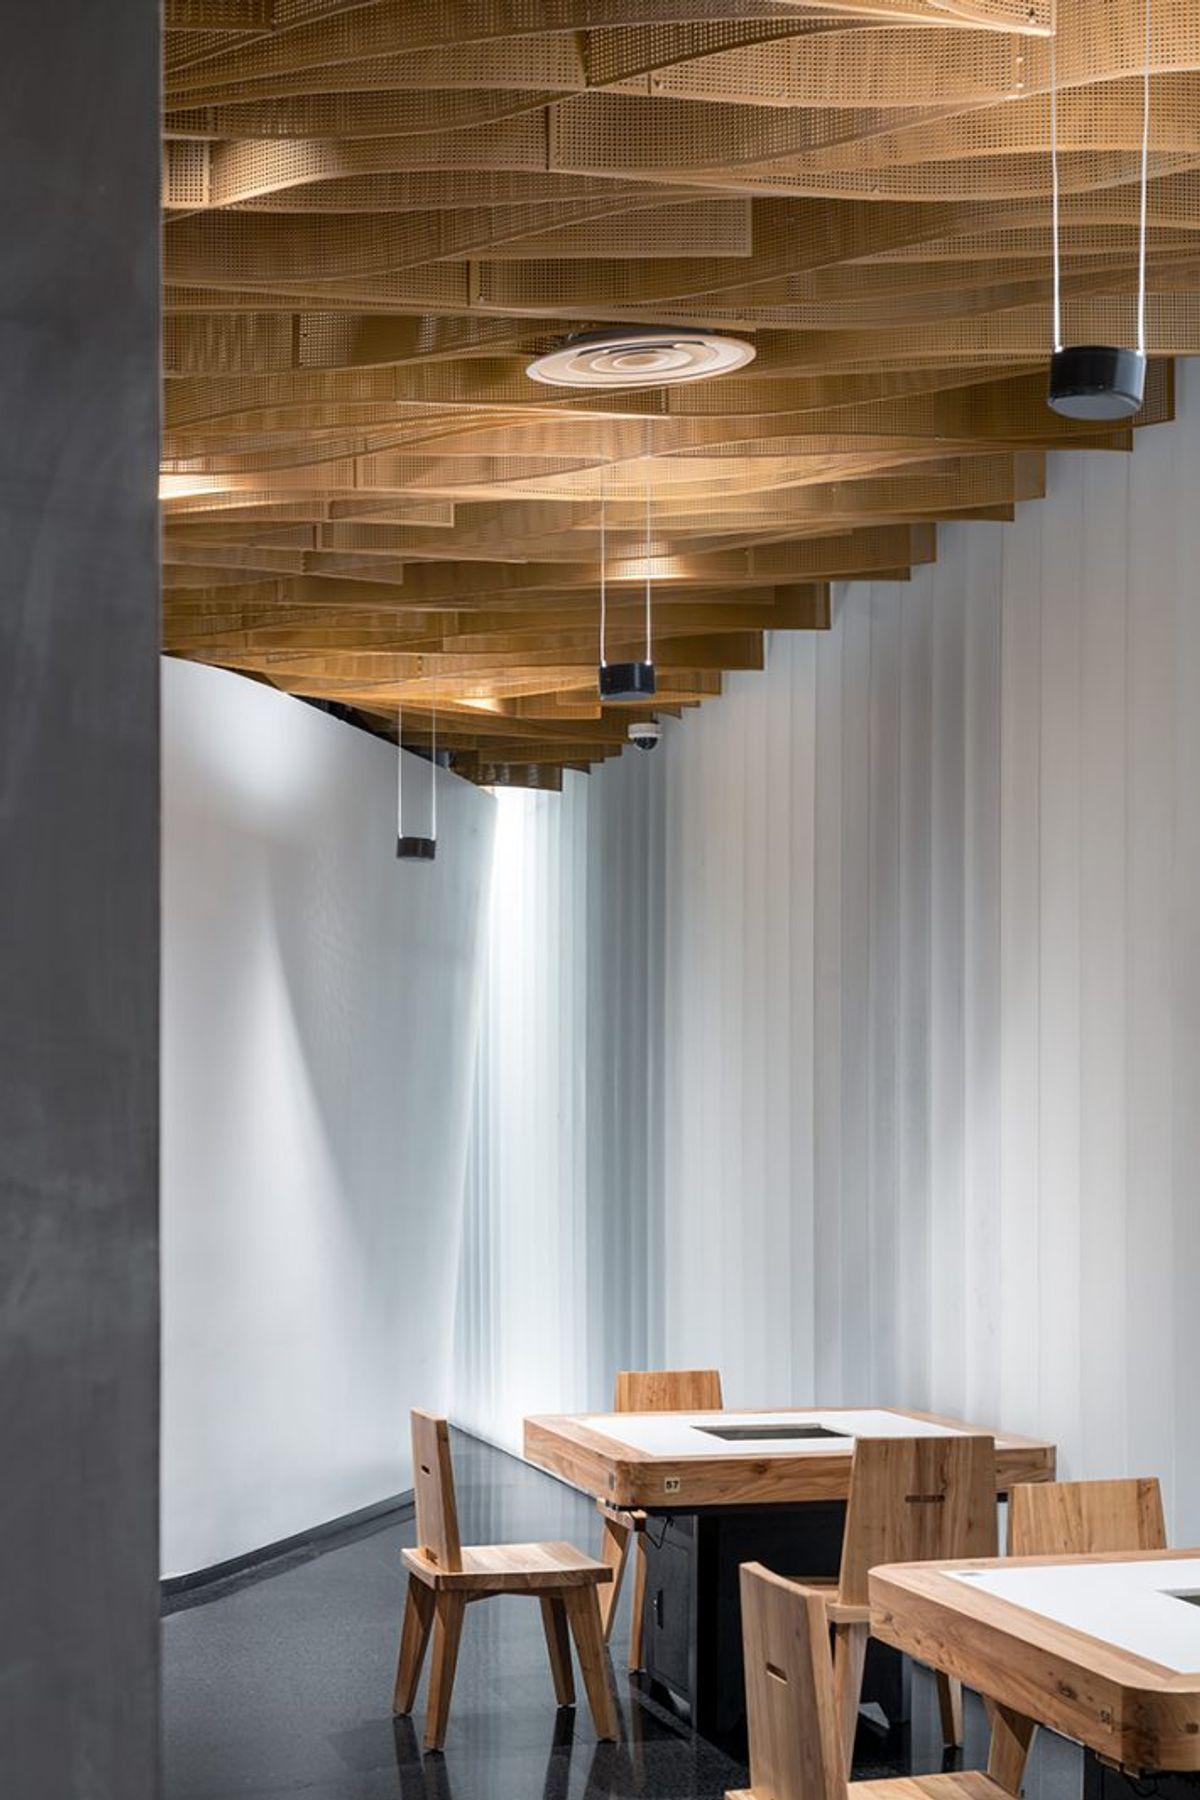 Banu Hotpot Restaurant Ceiling and Facade Design